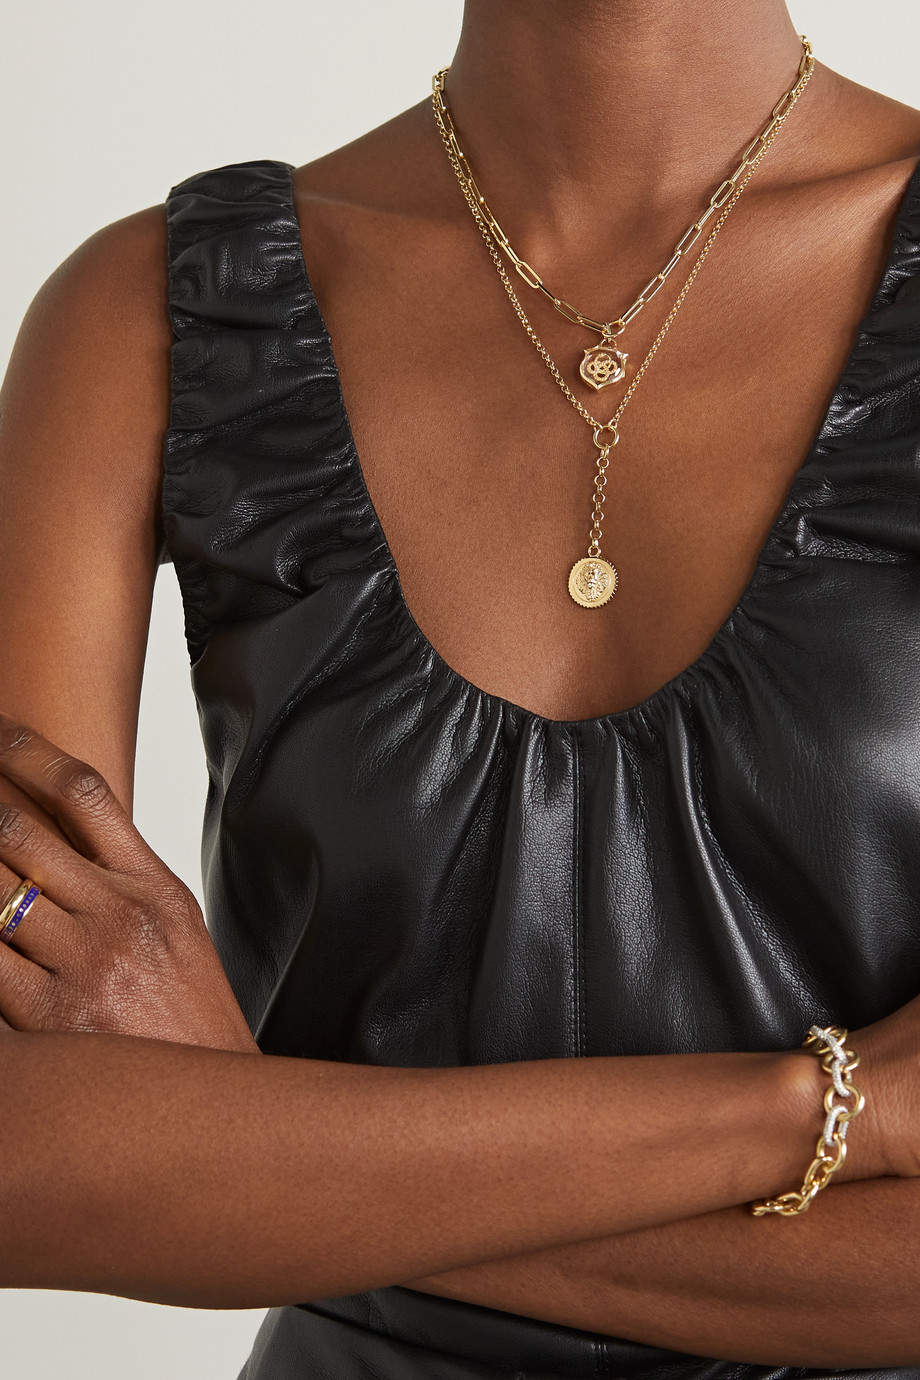 Foundrae Wholeness 18-karat gold quartz necklace